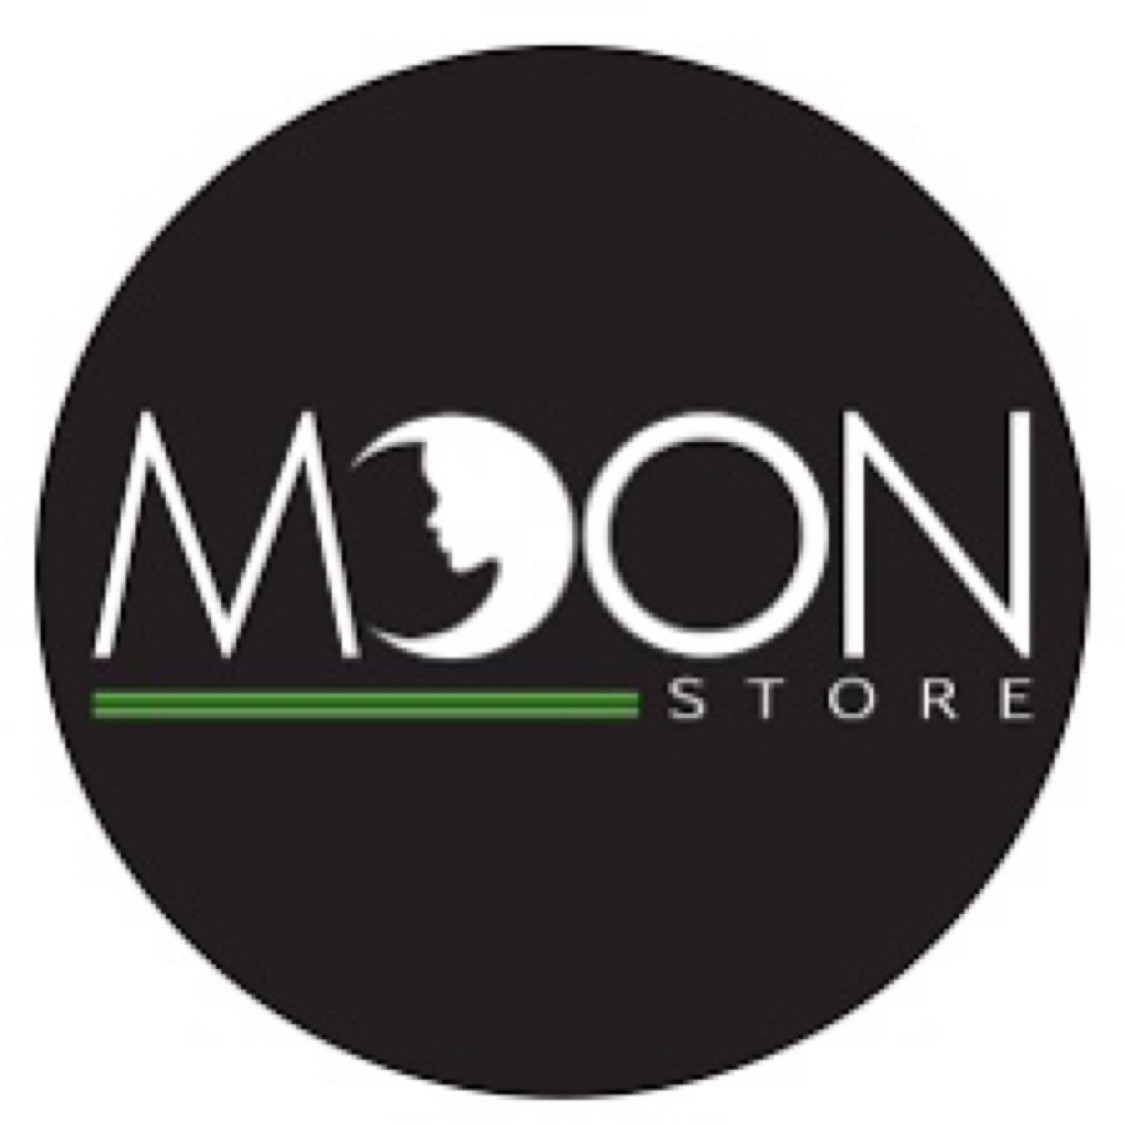 Store Moon